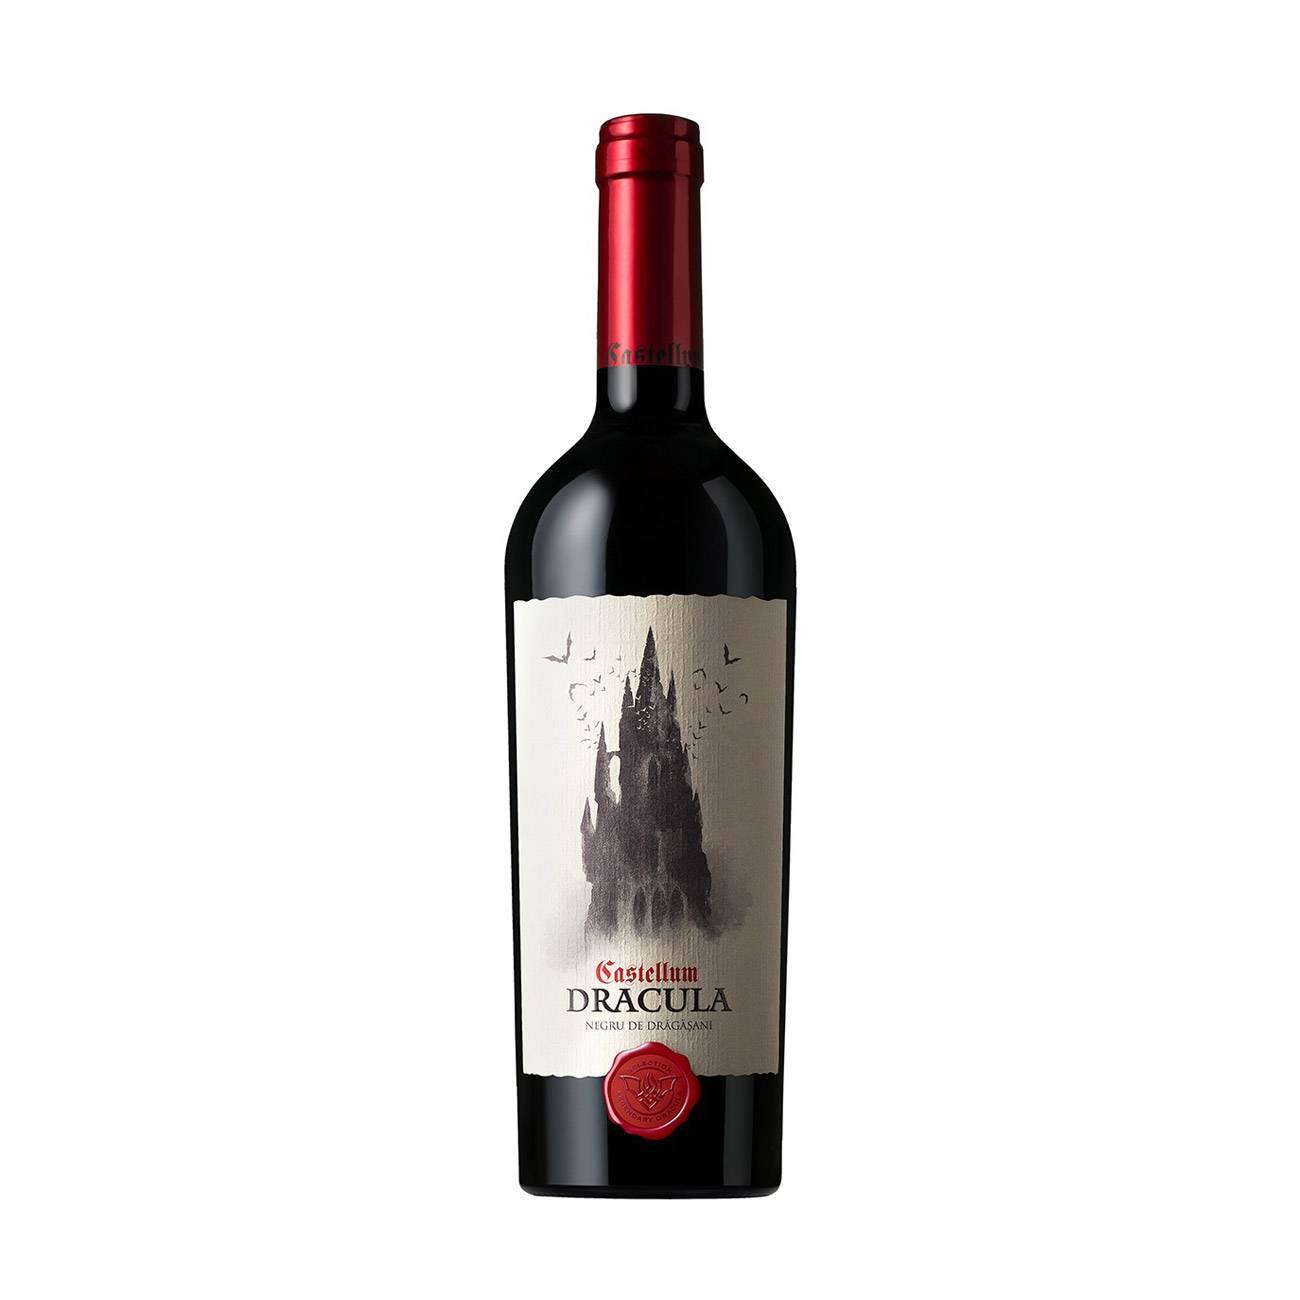 Vinuri, CASTELLUM DRACULA NEGRU DE DRAGASANI 750ml, Legendary Dracula